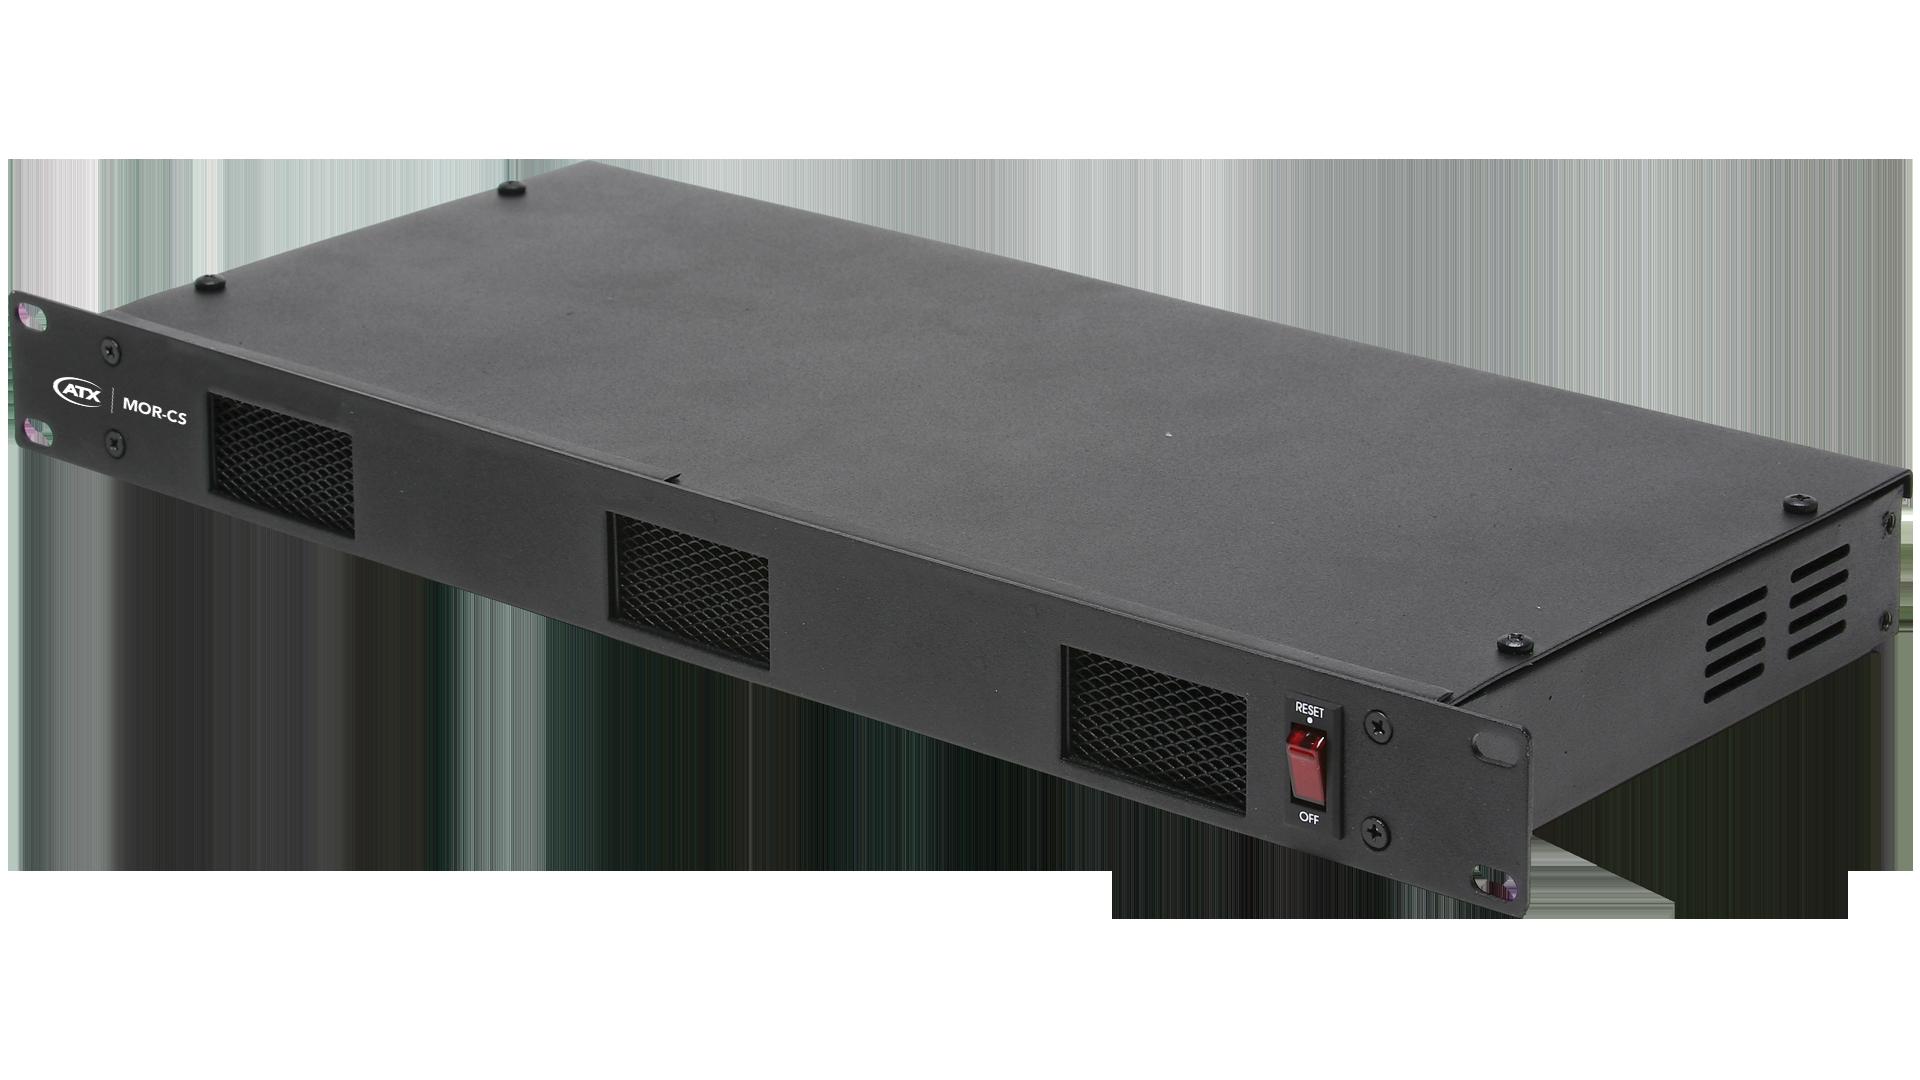 MOR-CS: Headend Cooling System